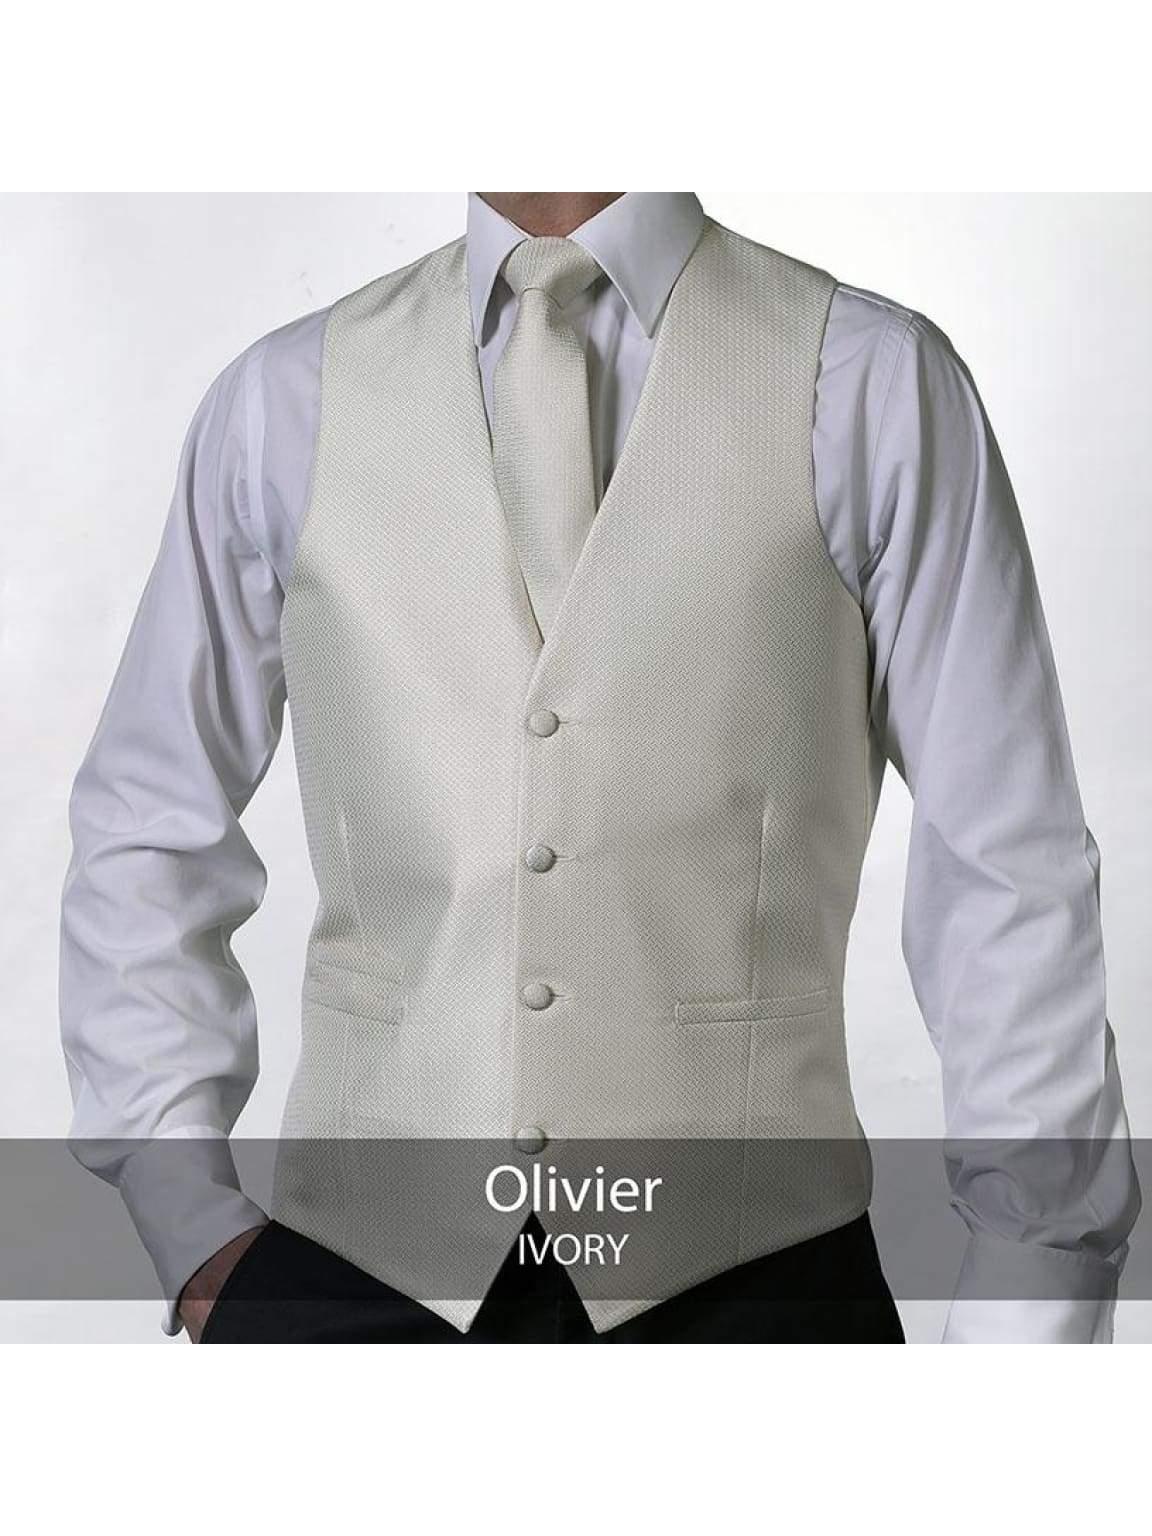 Heirloom Olivier Mens Ivory Luxury 100% Wool Tweed Waistcoat - 34R - WAISTCOATS